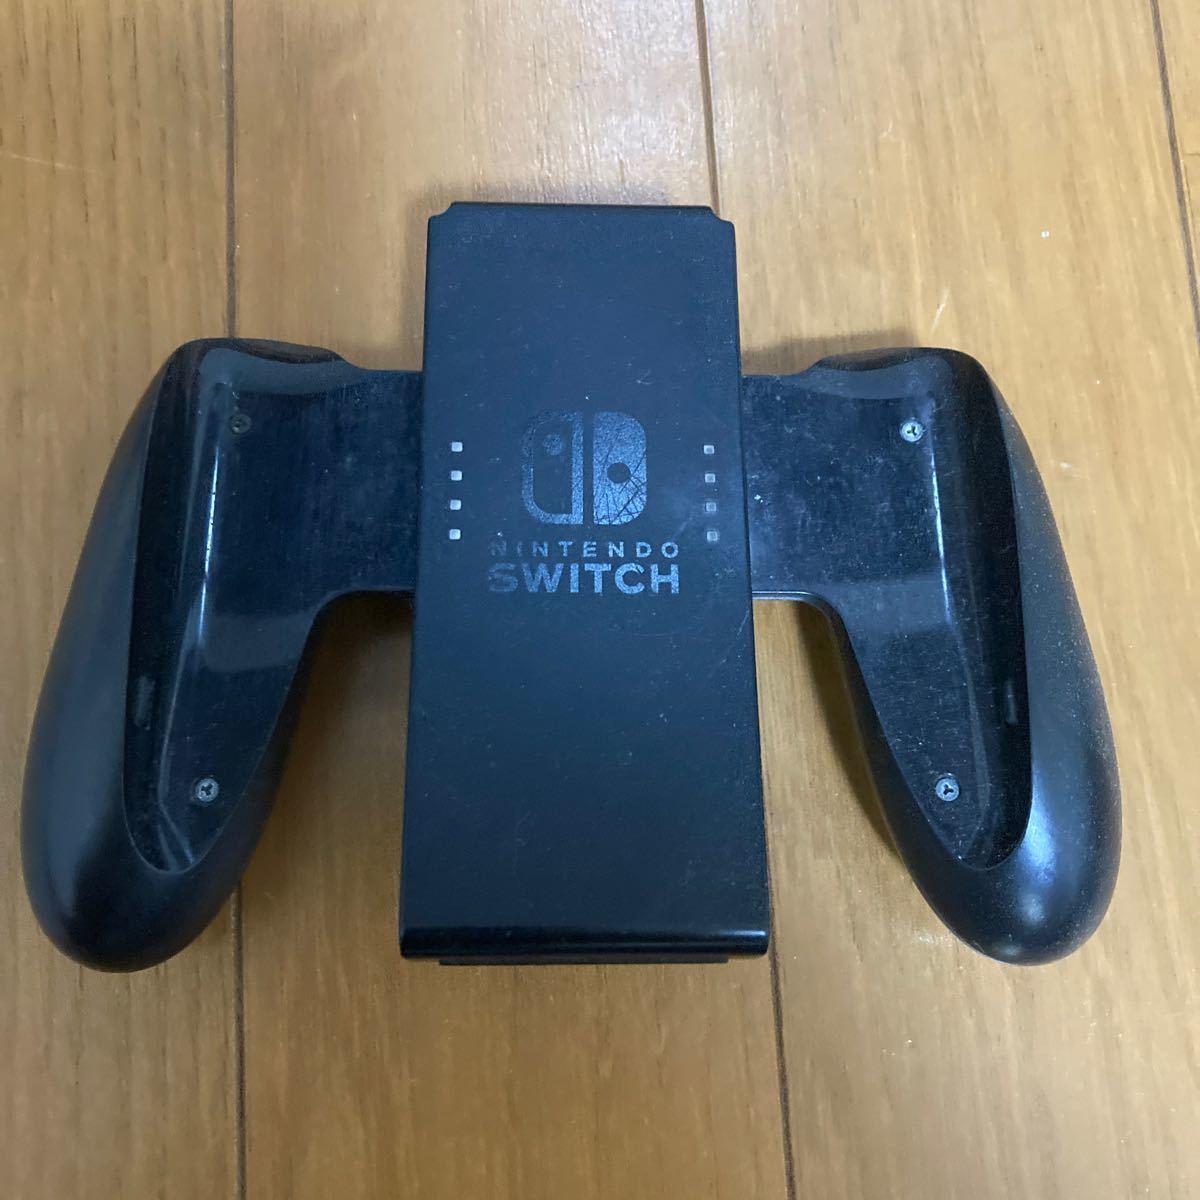 Nintendo Switch ニンテンドースイッチ本体 ニンテンドースイッチ 任天堂スイッチ ジョイコン Wi-Fiモデル